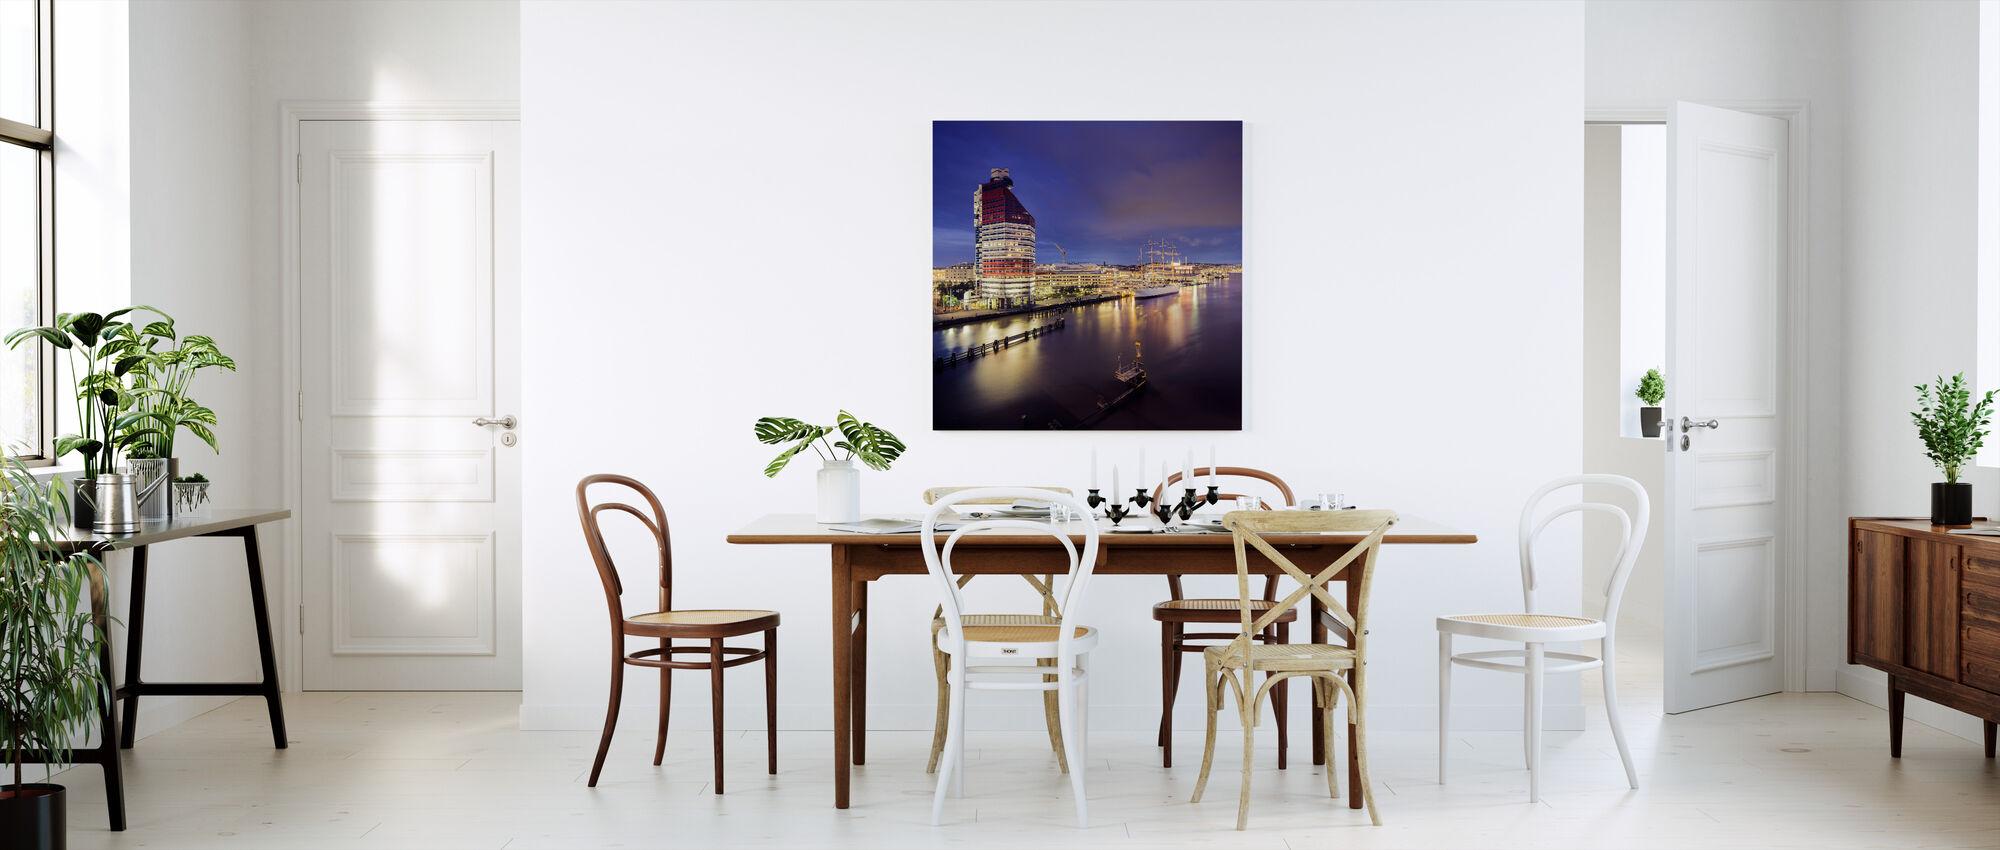 Göteborgs hamn, Sverige - Canvastavla - Kök